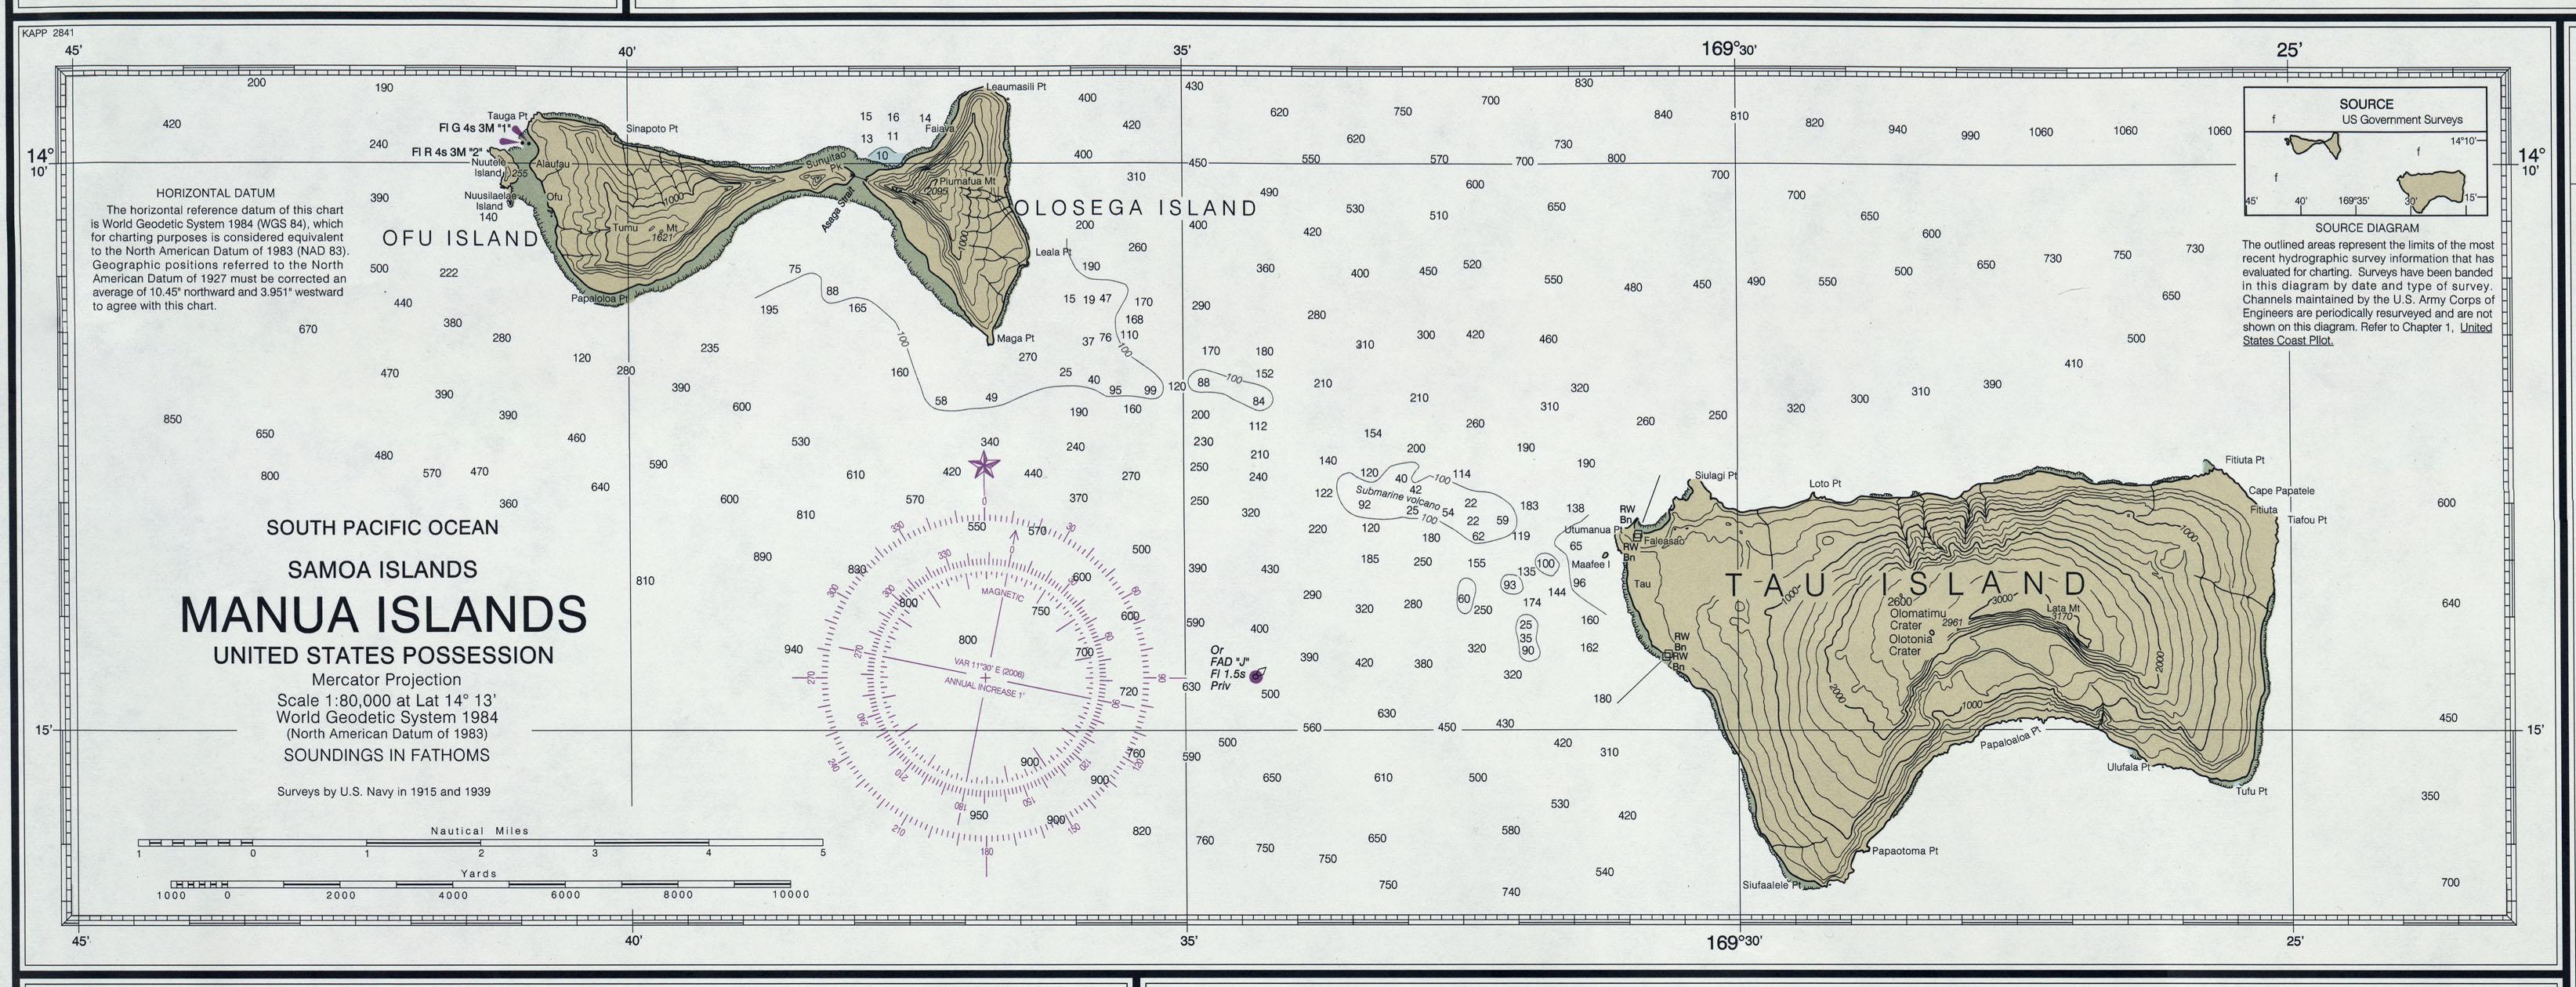 american samoa maps - perry-casta u00f1eda map collection